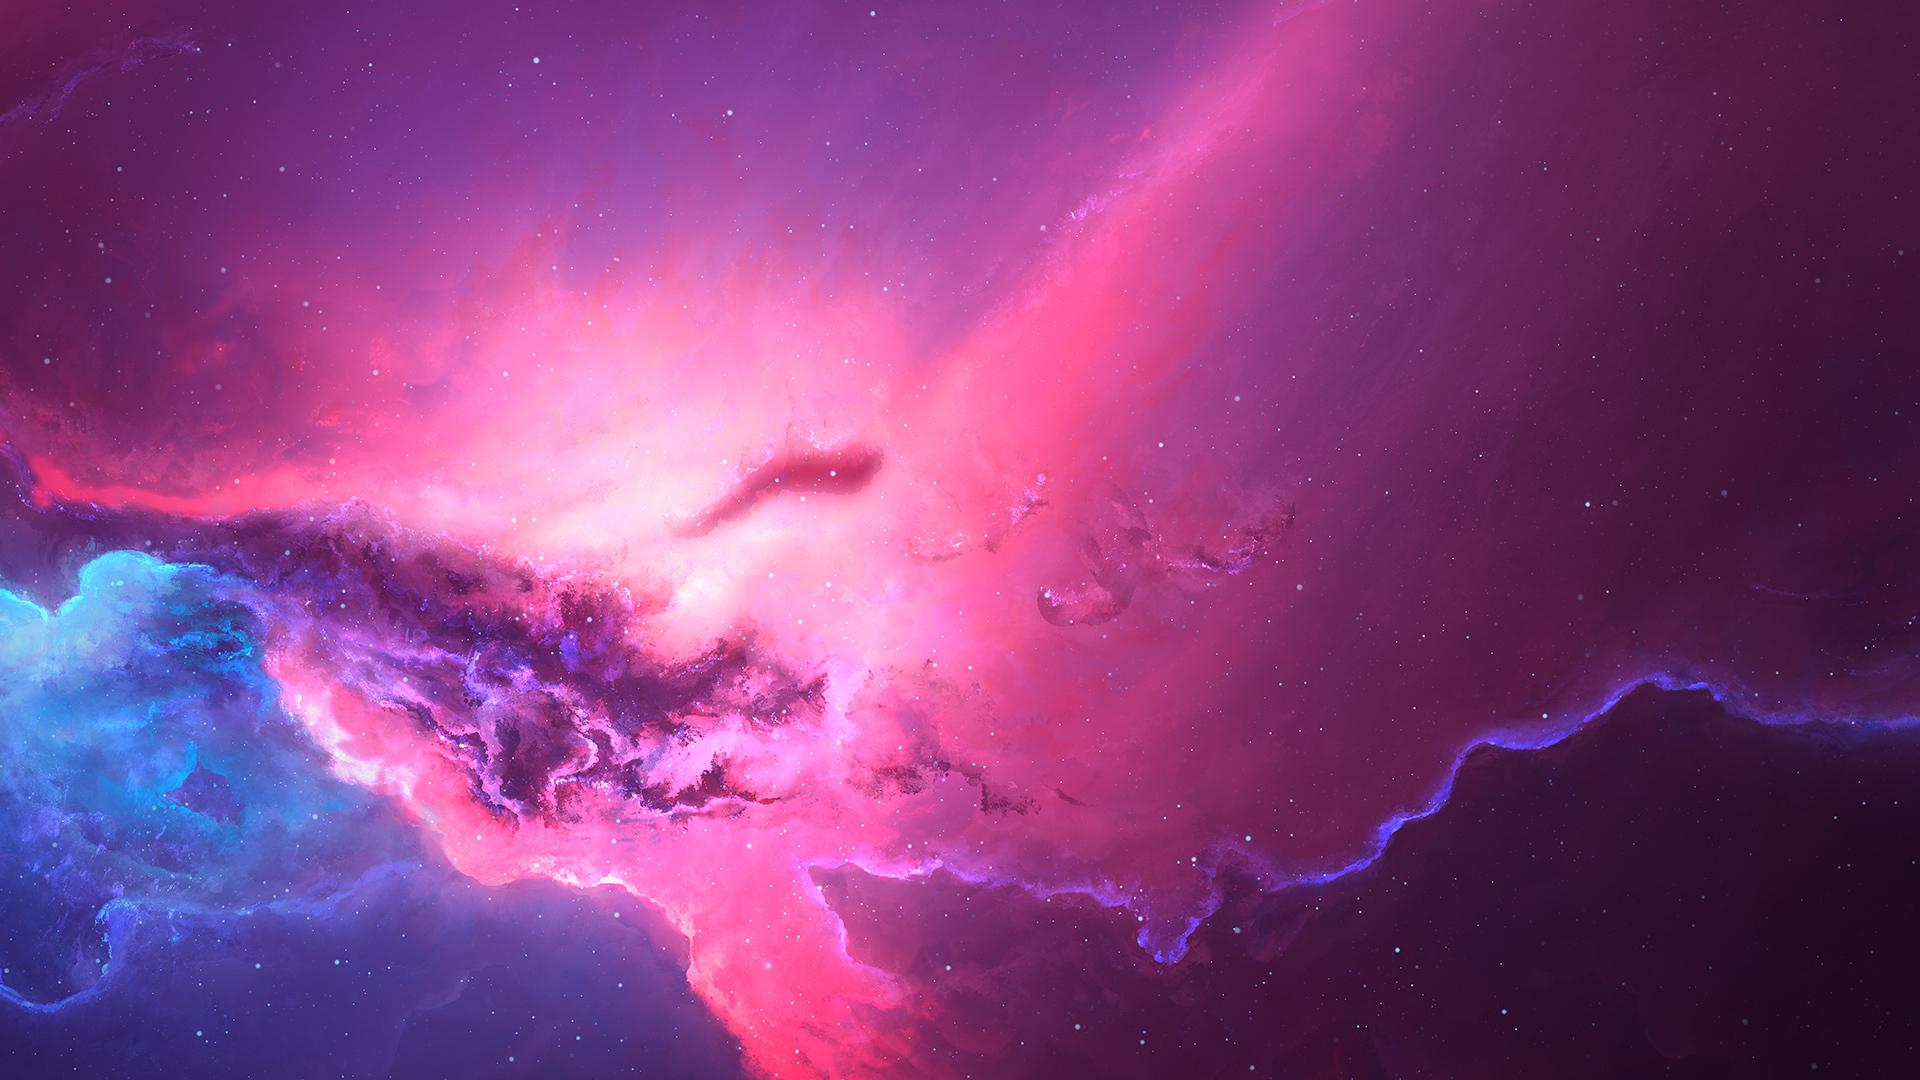 1920x1080 Pink Red Nebula Space Cosmos 4k Laptop Full Hd 1080p Hd